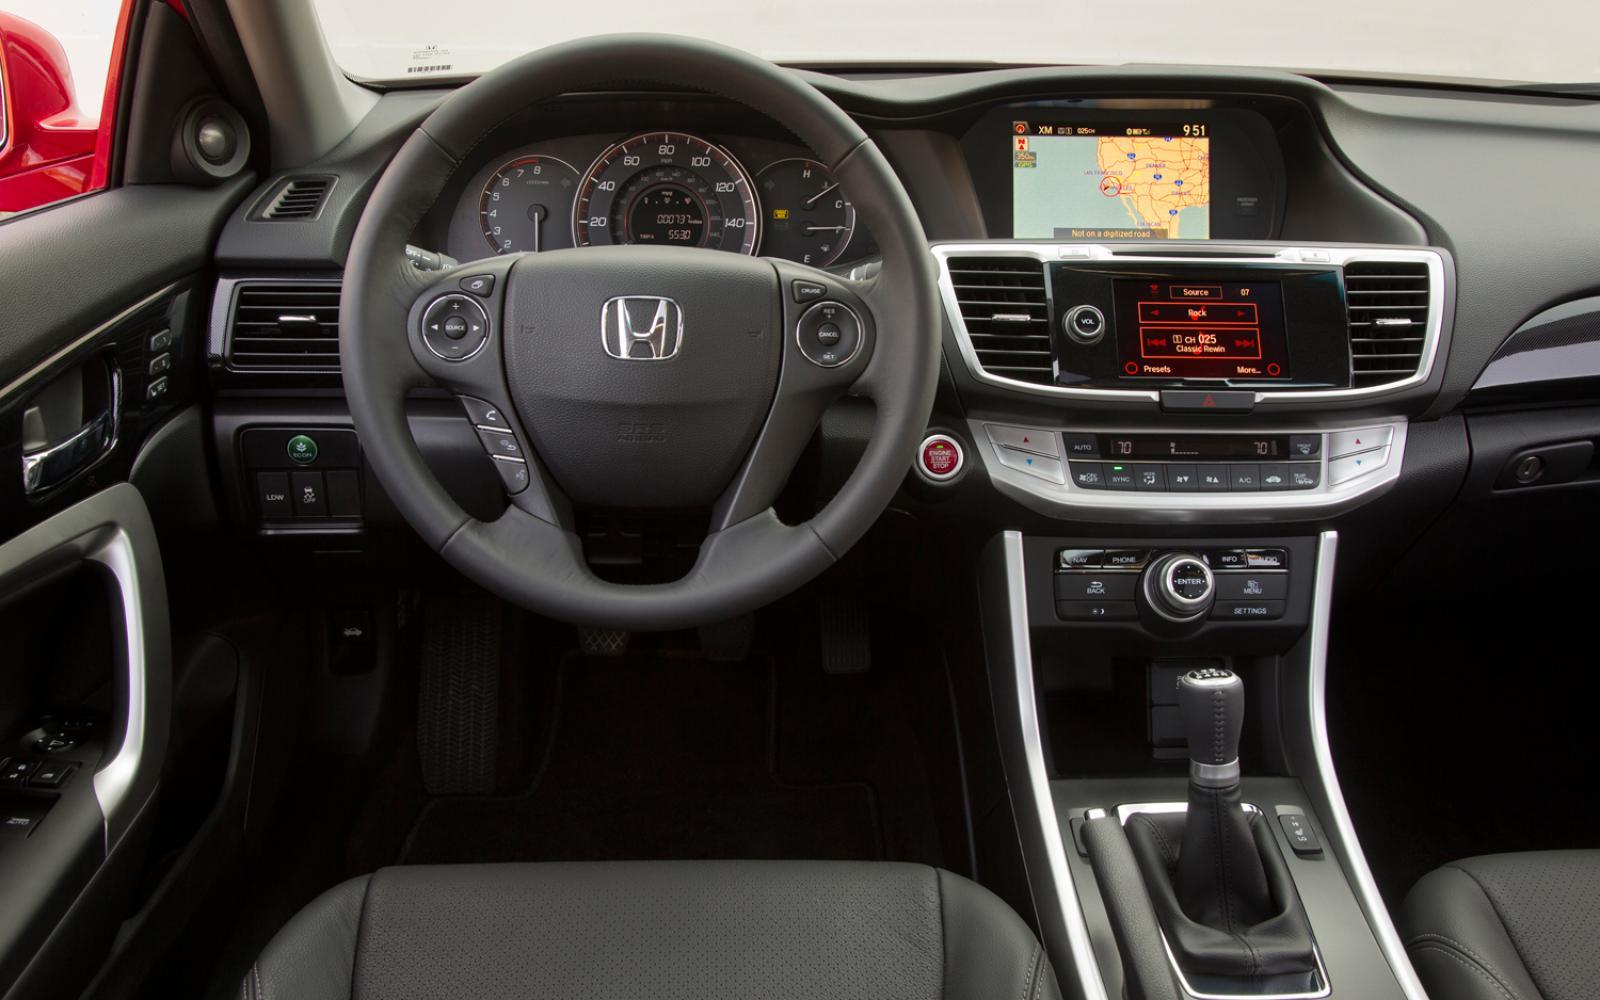 800 1024 1280 1600 origin 2013 Honda Accord ...